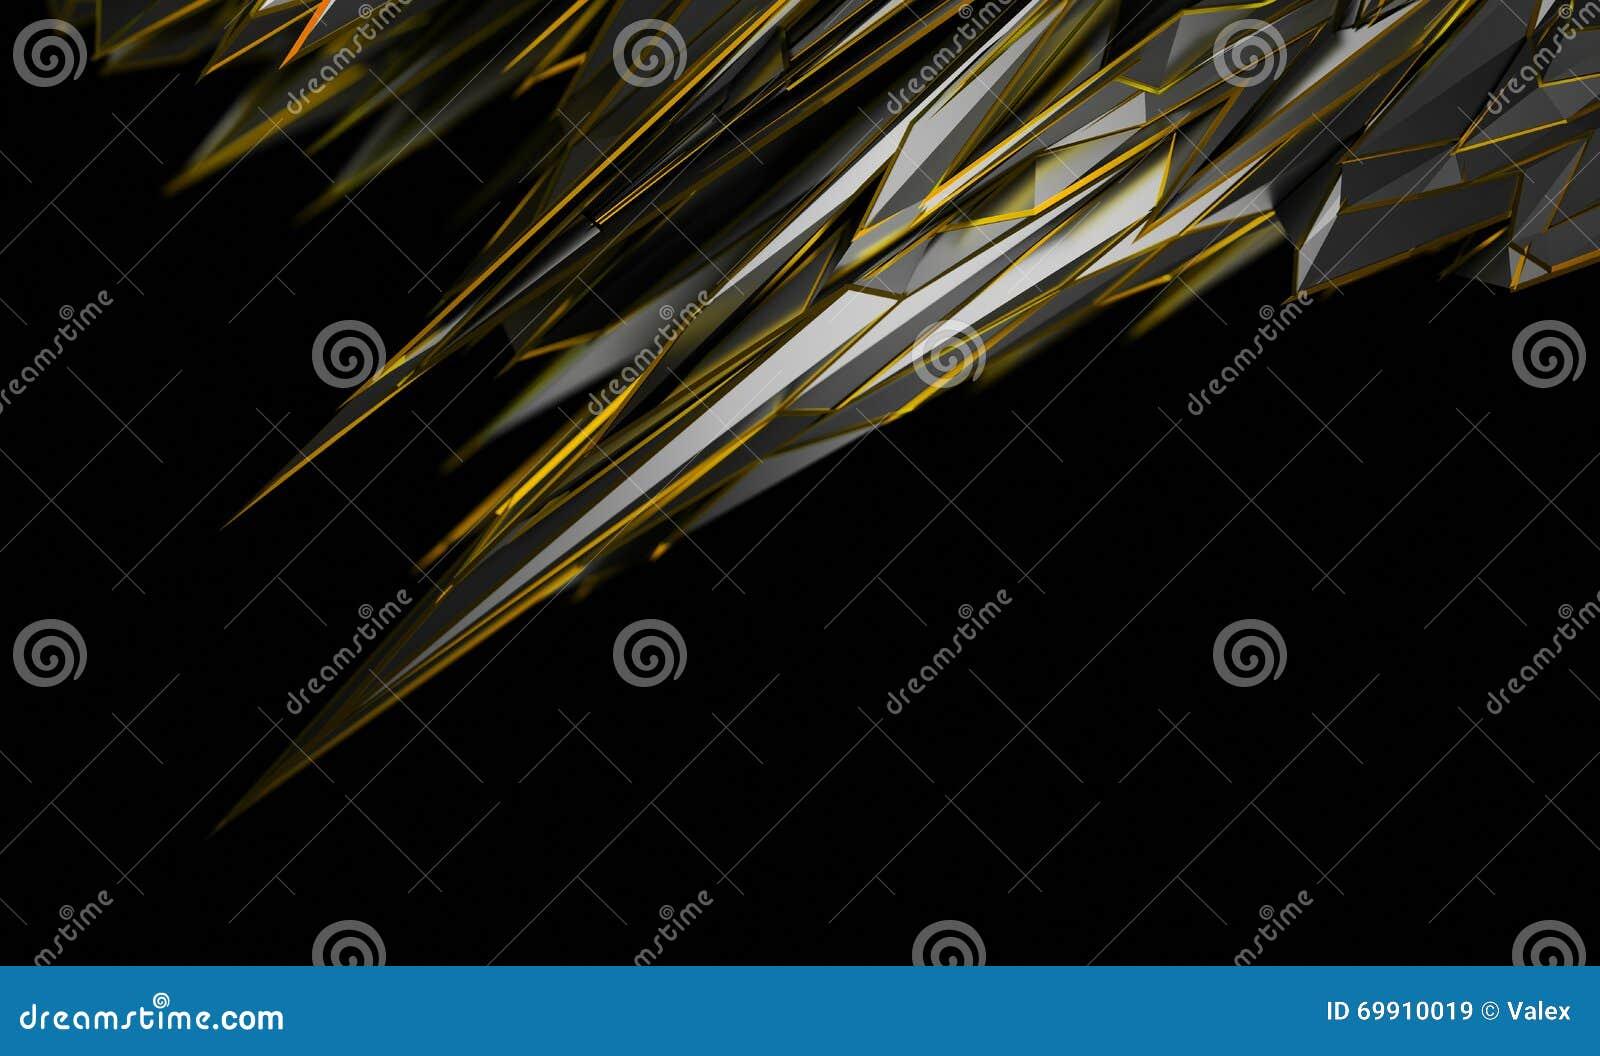 forma abstracta 3d fondos - photo #4